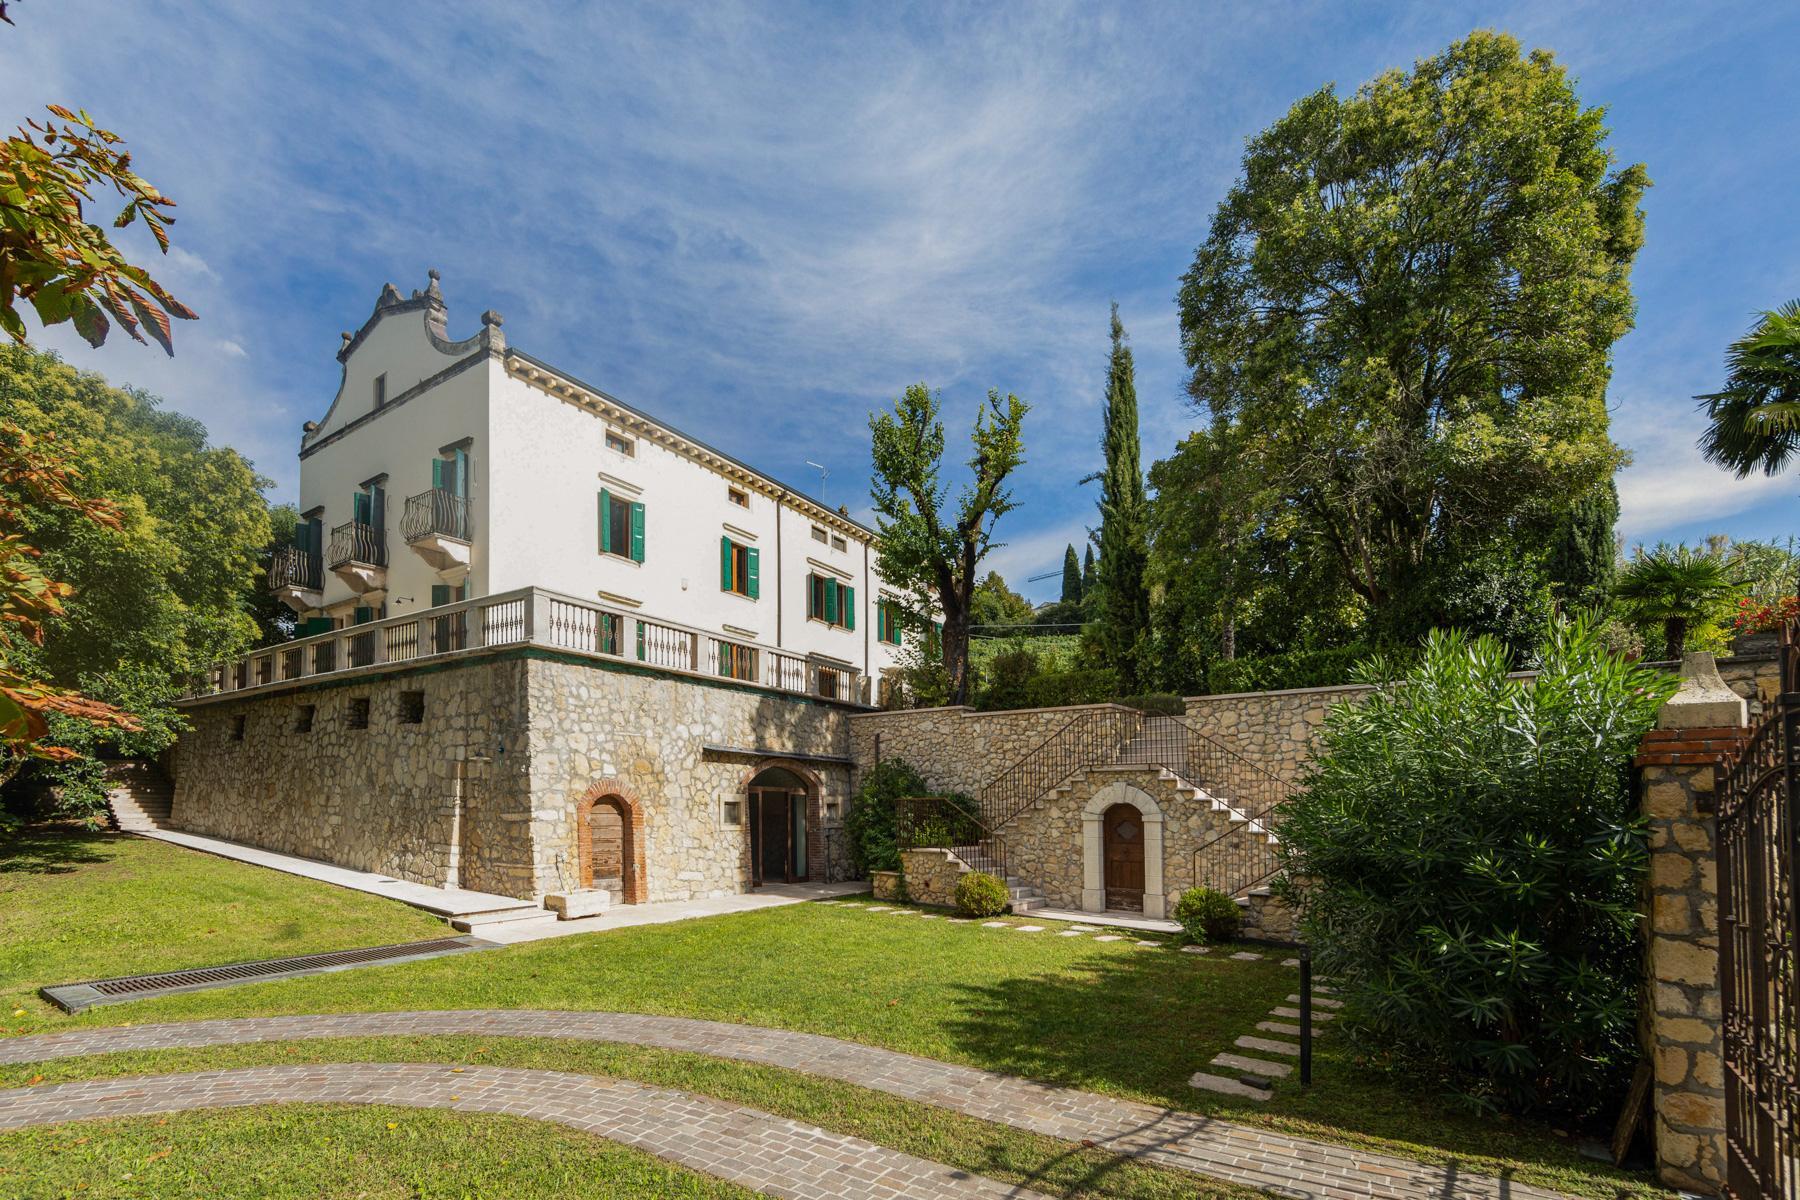 Villa historique dans la Valpolicella - 1